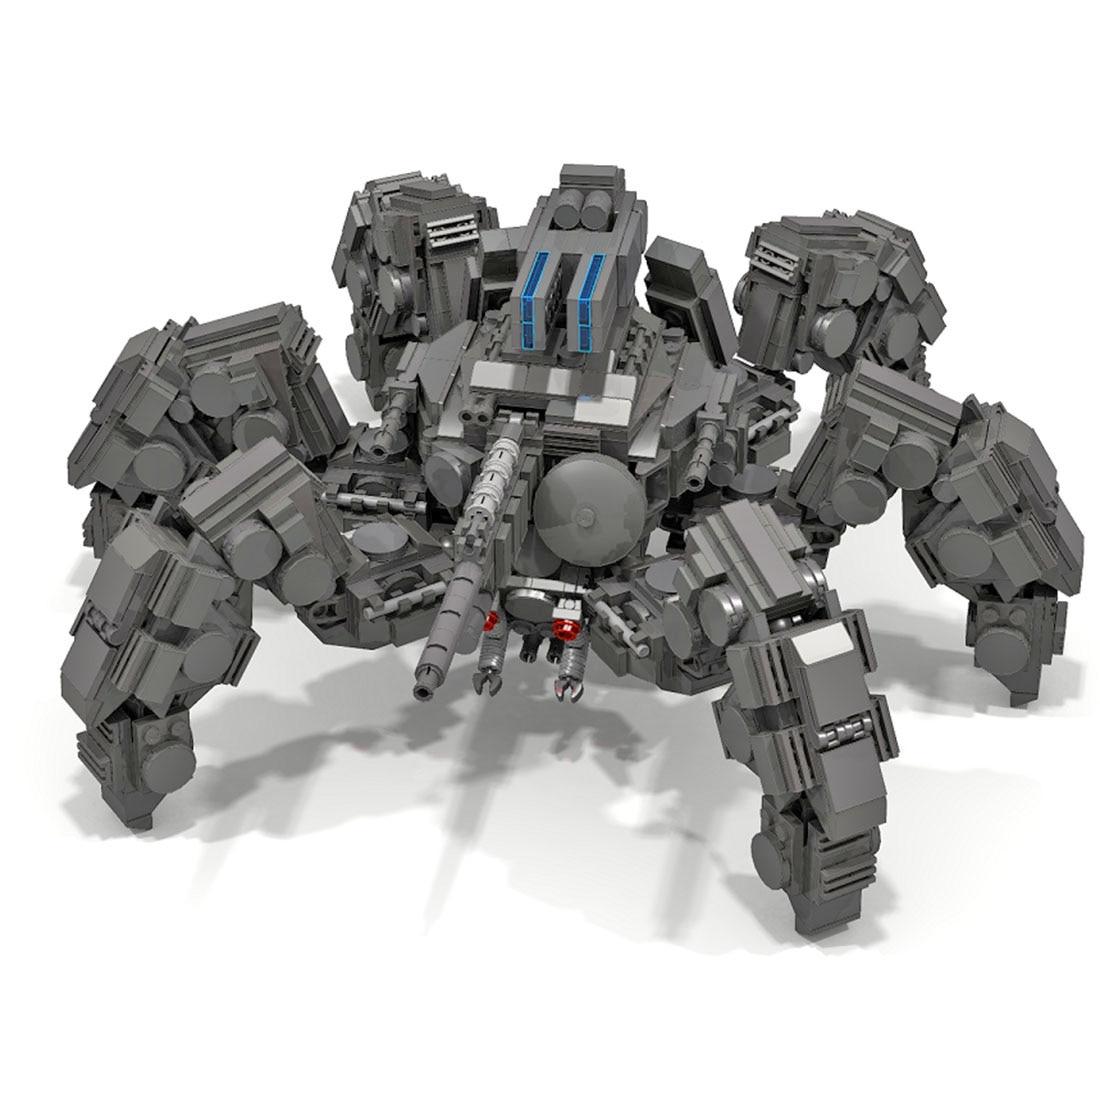 1470Pcs MOC Multi-legged Tarantula Model Small Particle Building Blocks Educational Toy Gift Set For Christmas - Dark Grey